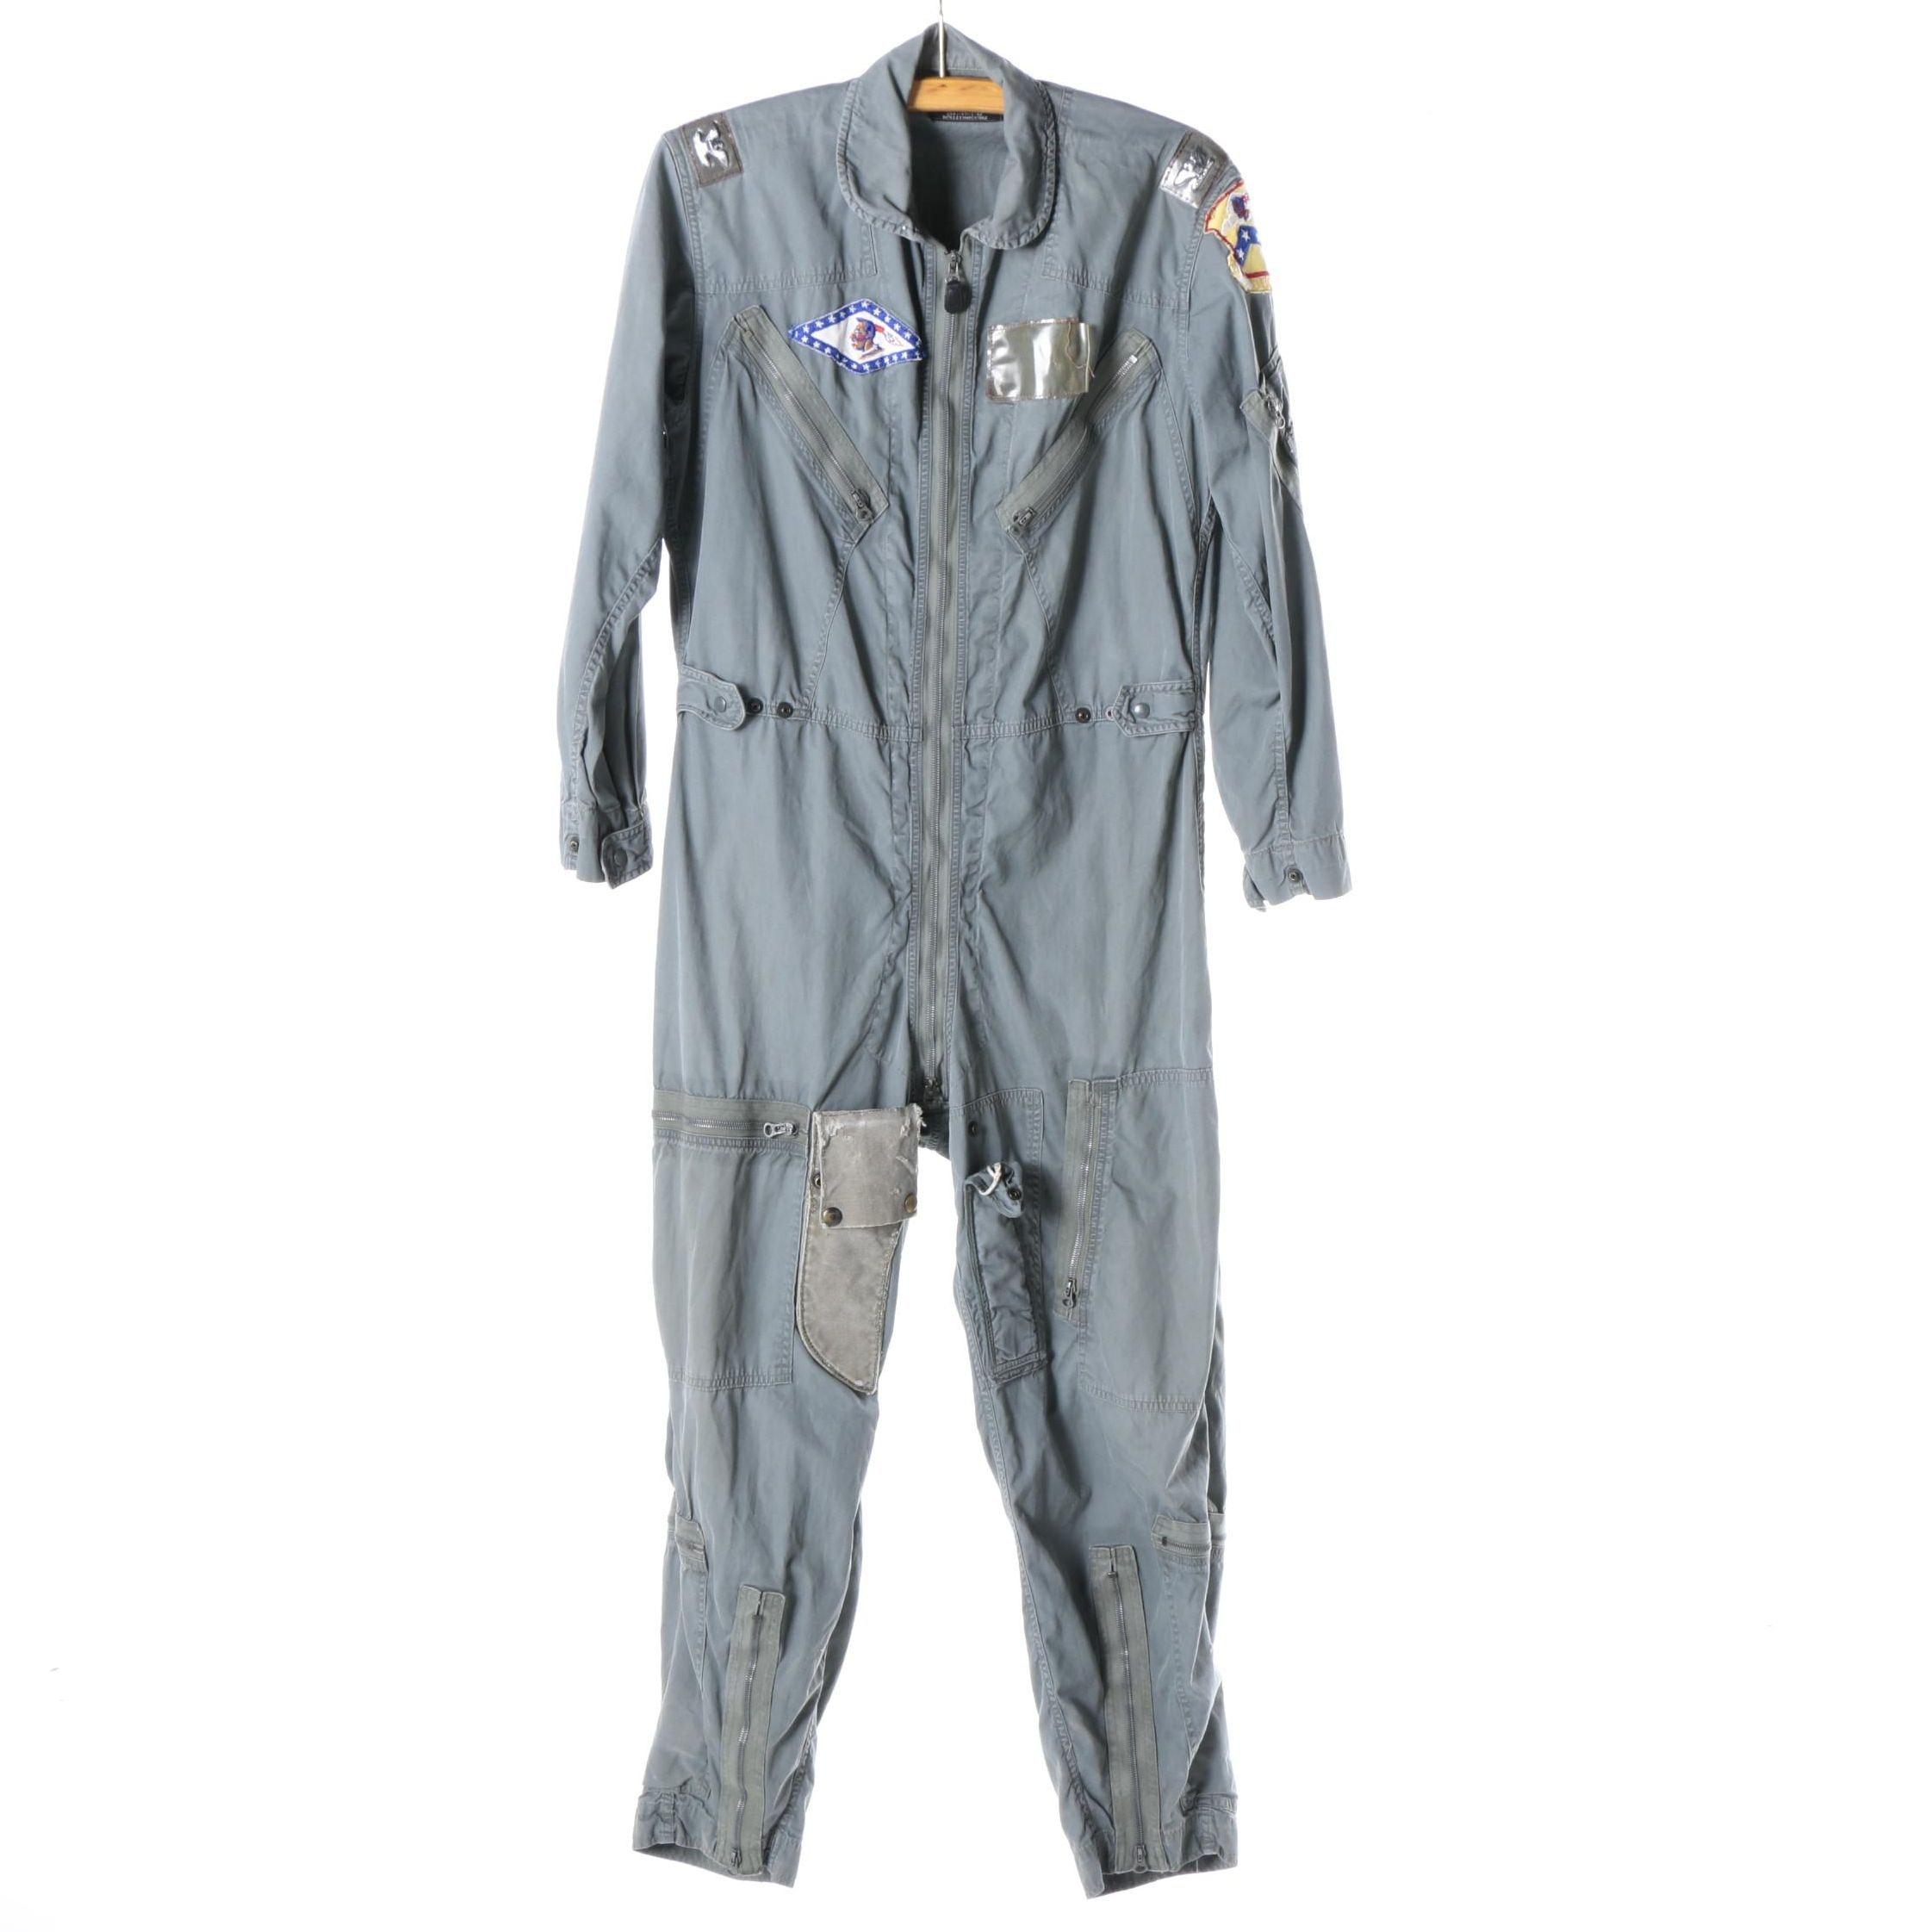 Circa 1960s Mason & Hughes, Inc. US Air Force Flight Suit